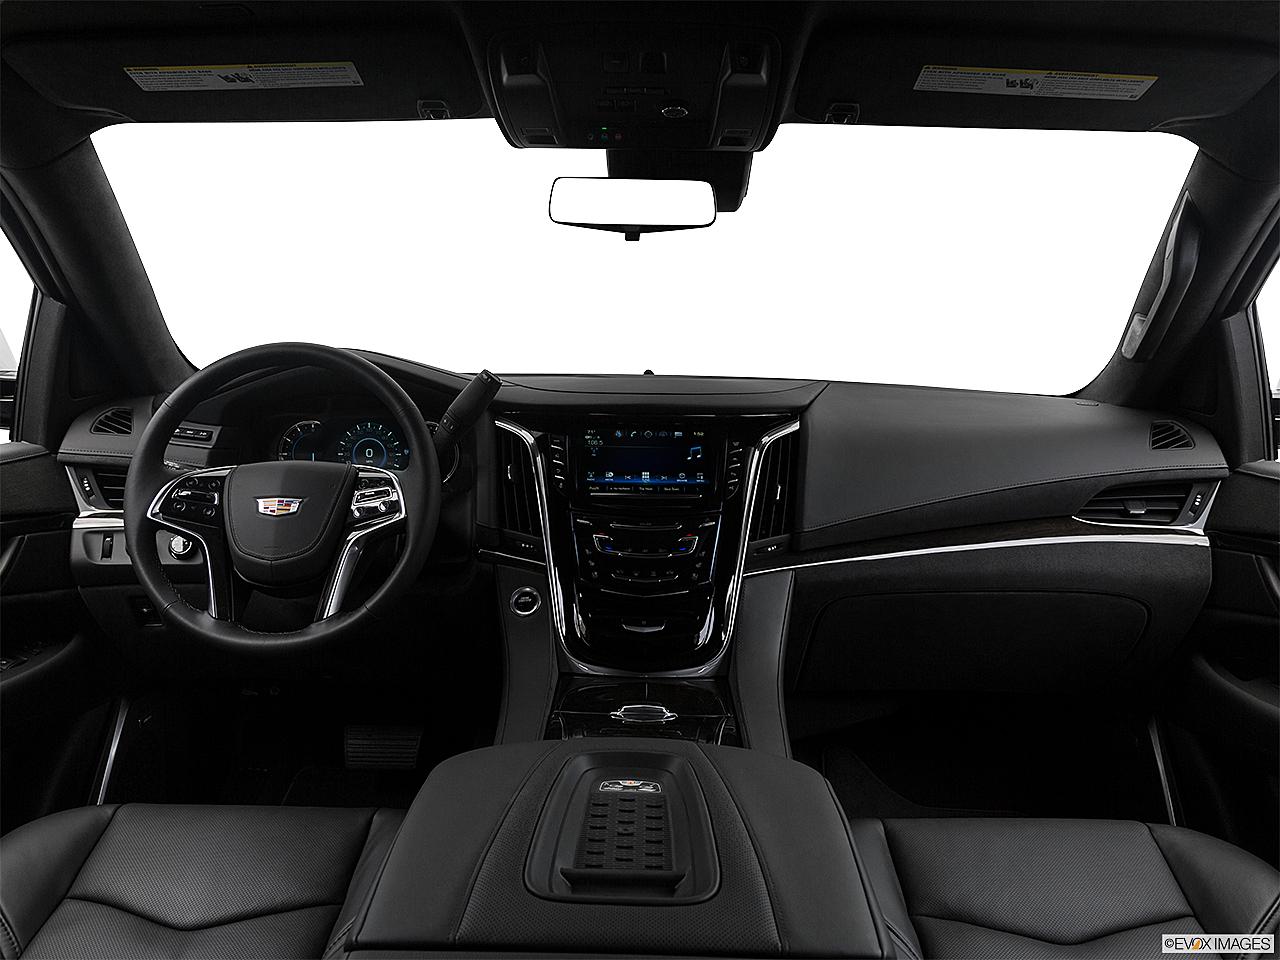 2018 Cadillac Escalade 4x4 Platinum 4dr SUV - Research ...